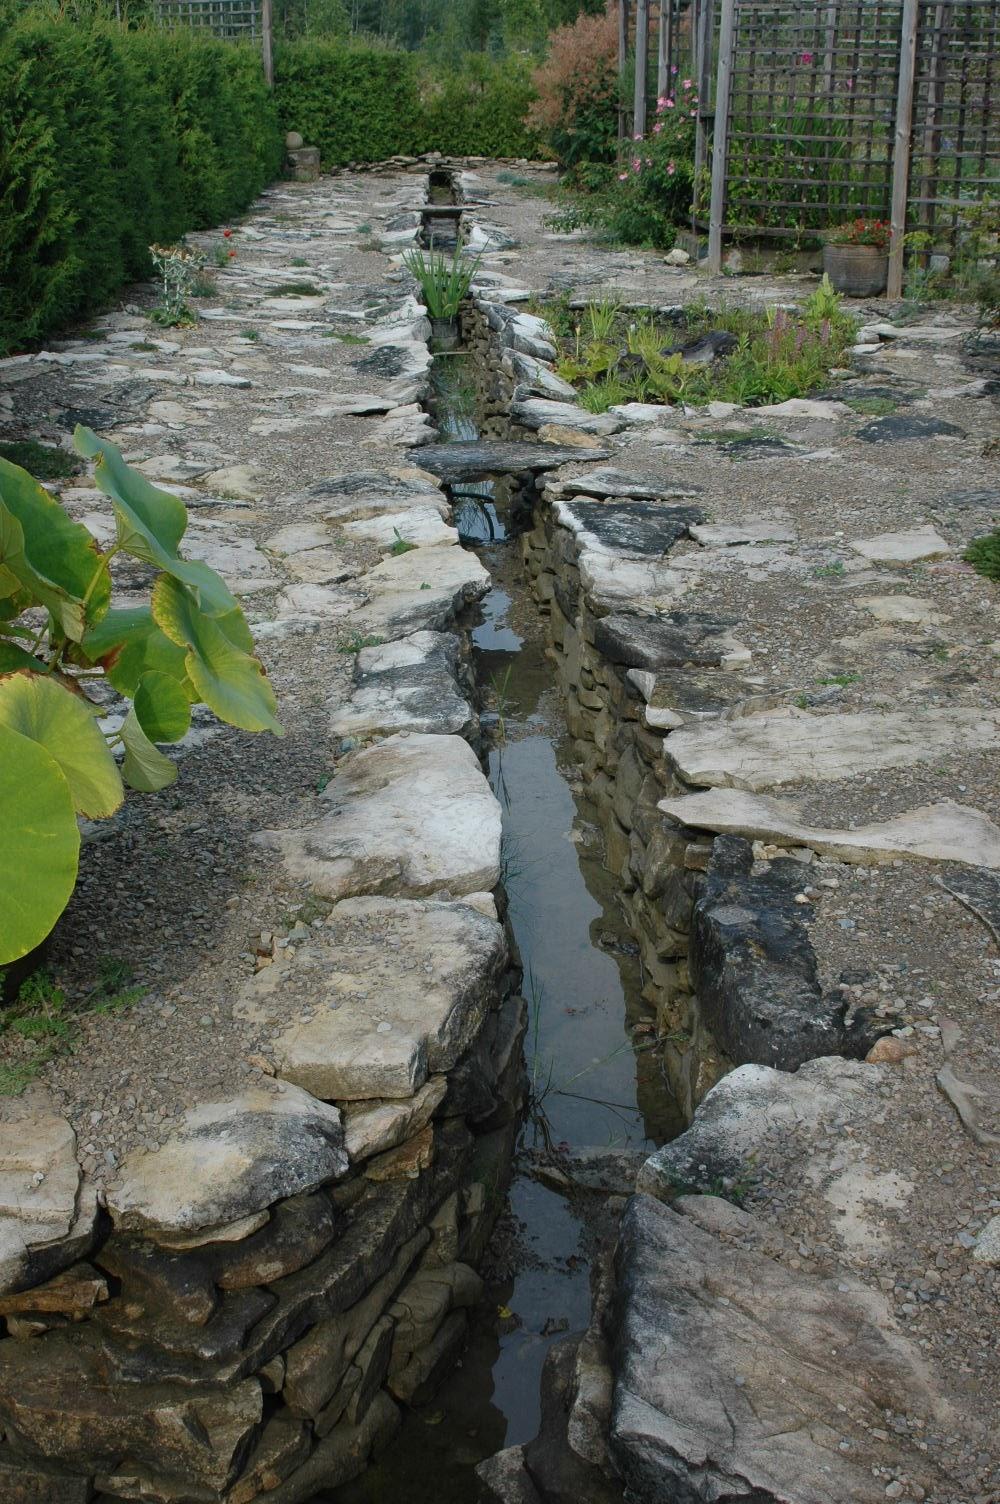 Roche Fleurie Garden The Rill